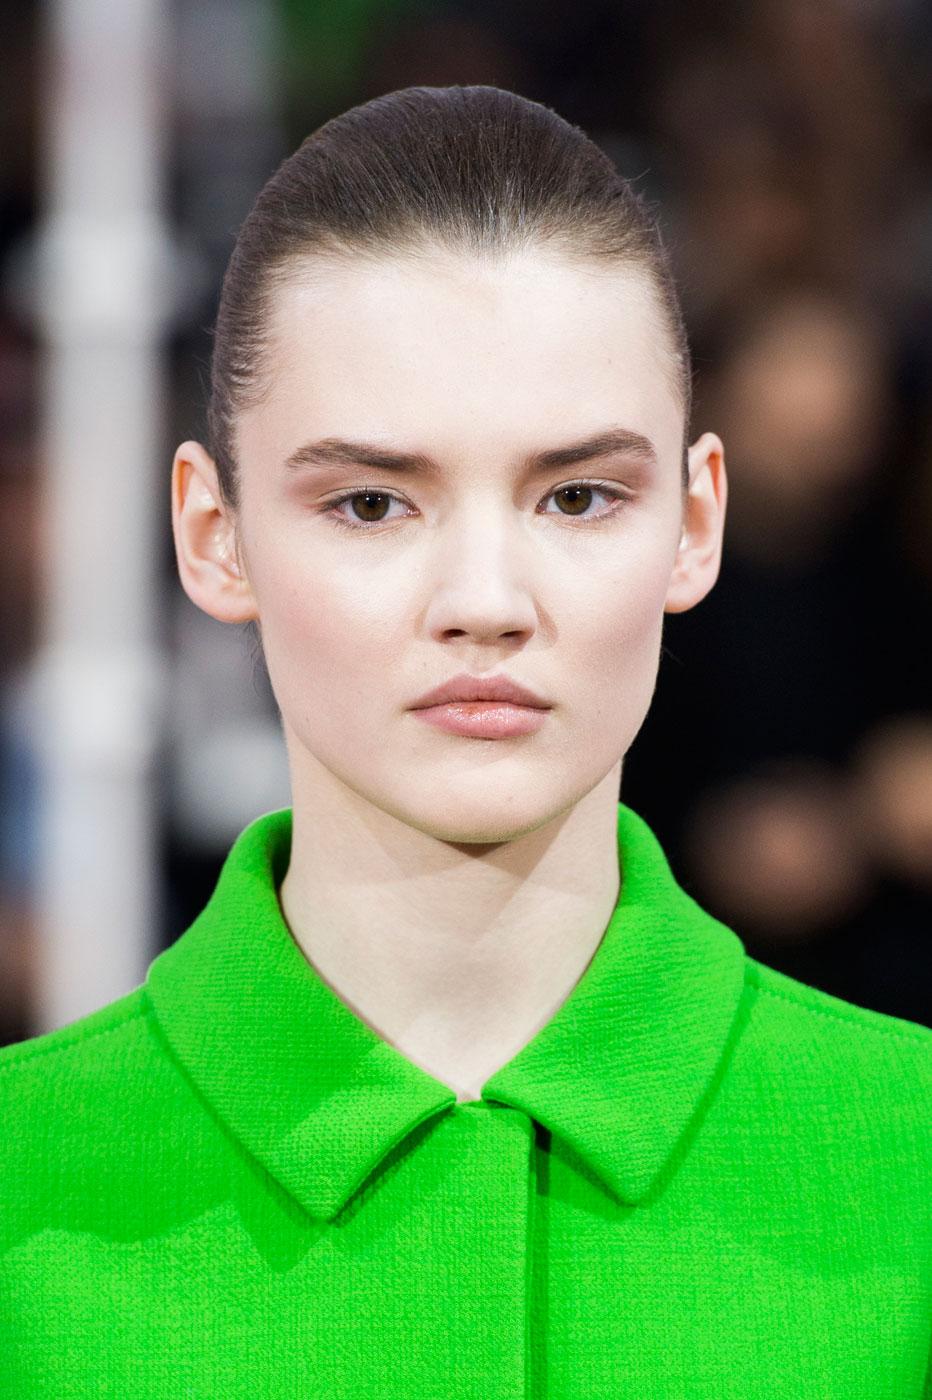 Christian-Dior-fashion-runway-show-close-ups-haute-couture-paris-spring-summer-2015-the-impression-186